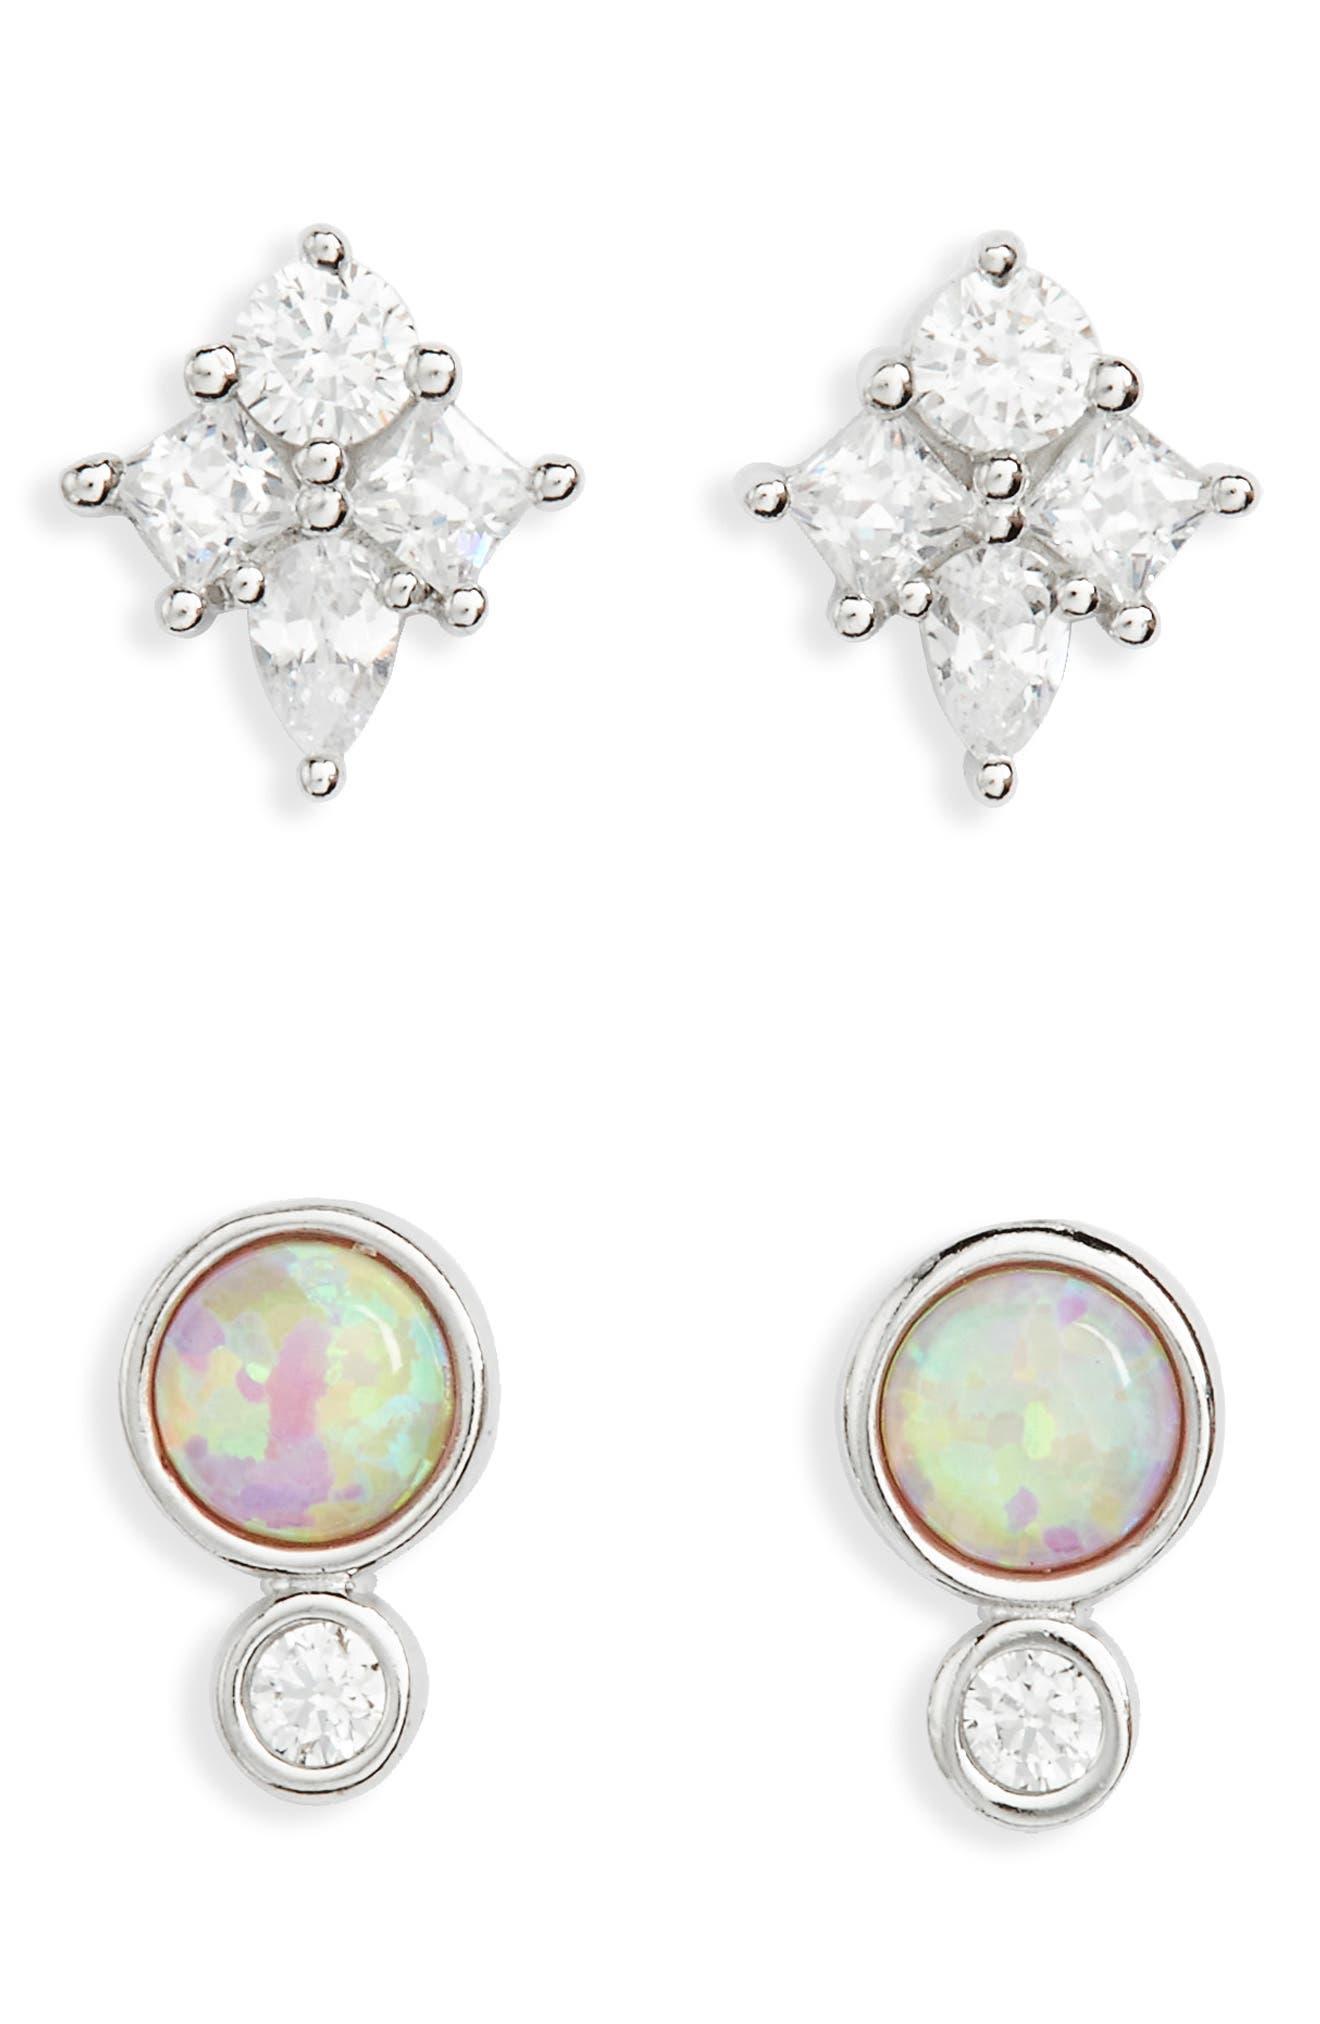 Main Image - Nordstrom Set of 2 Opal & Cubic Zirconia Stud Earrings